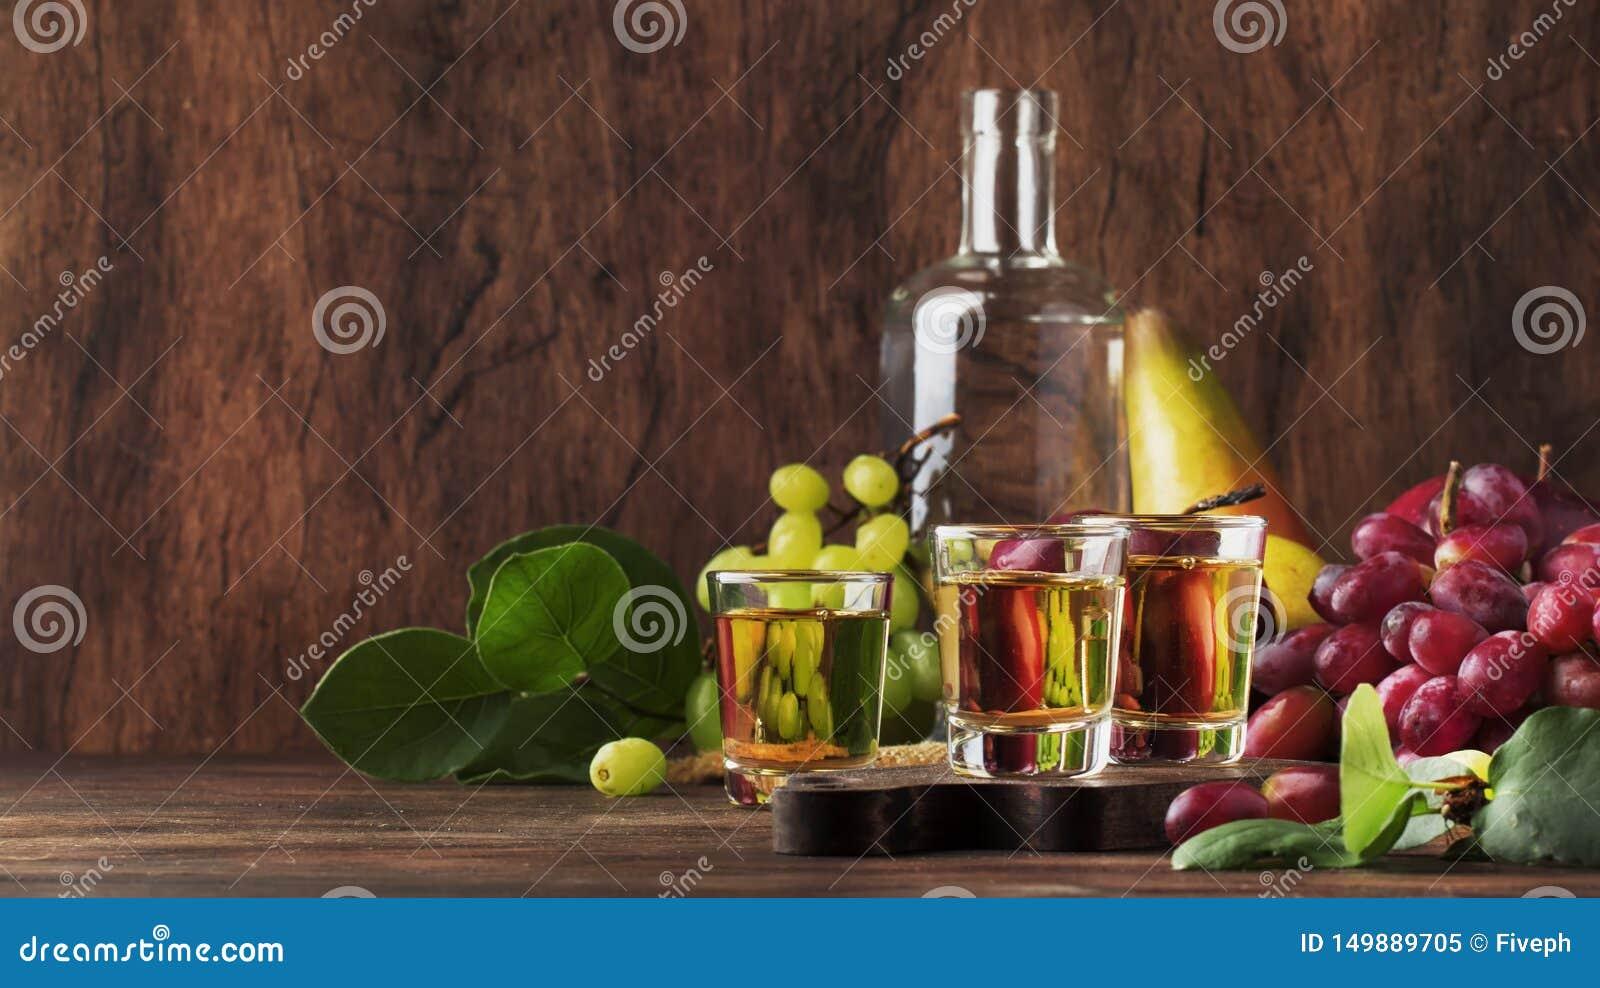 Rakija, raki ή rakia - βαλκανικός ισχυρός οινοπνευματώδης πίνει τον τύπο κονιάκ βασισμένο στα ζυμωνομμένα φρούτα, εκλεκτής ποιότη